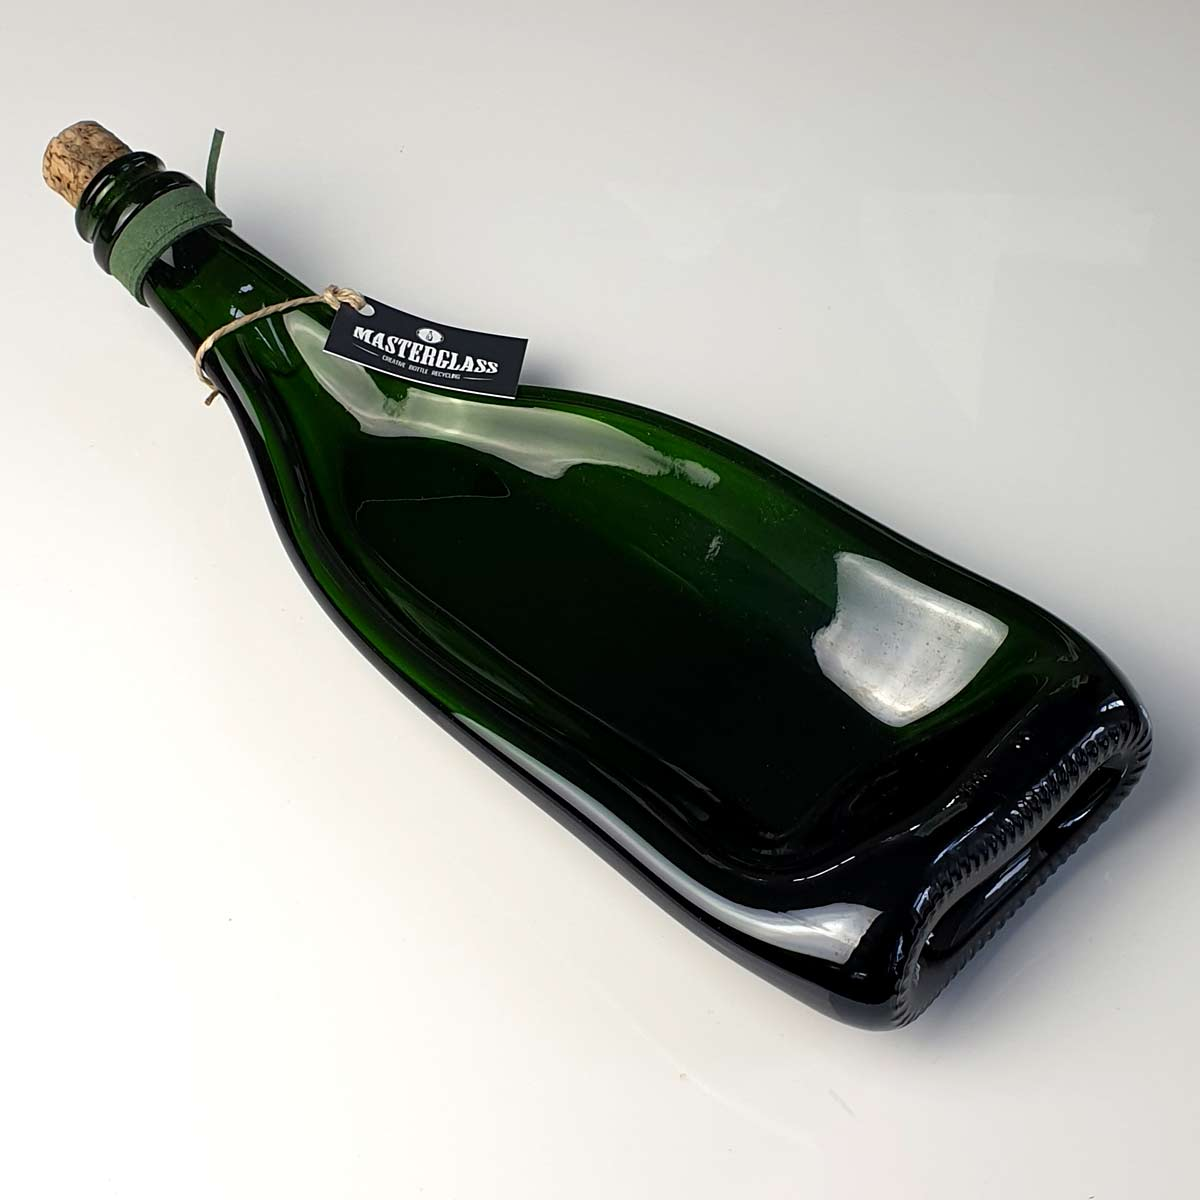 Tot borrelplank gesmolten fles Solo-Green